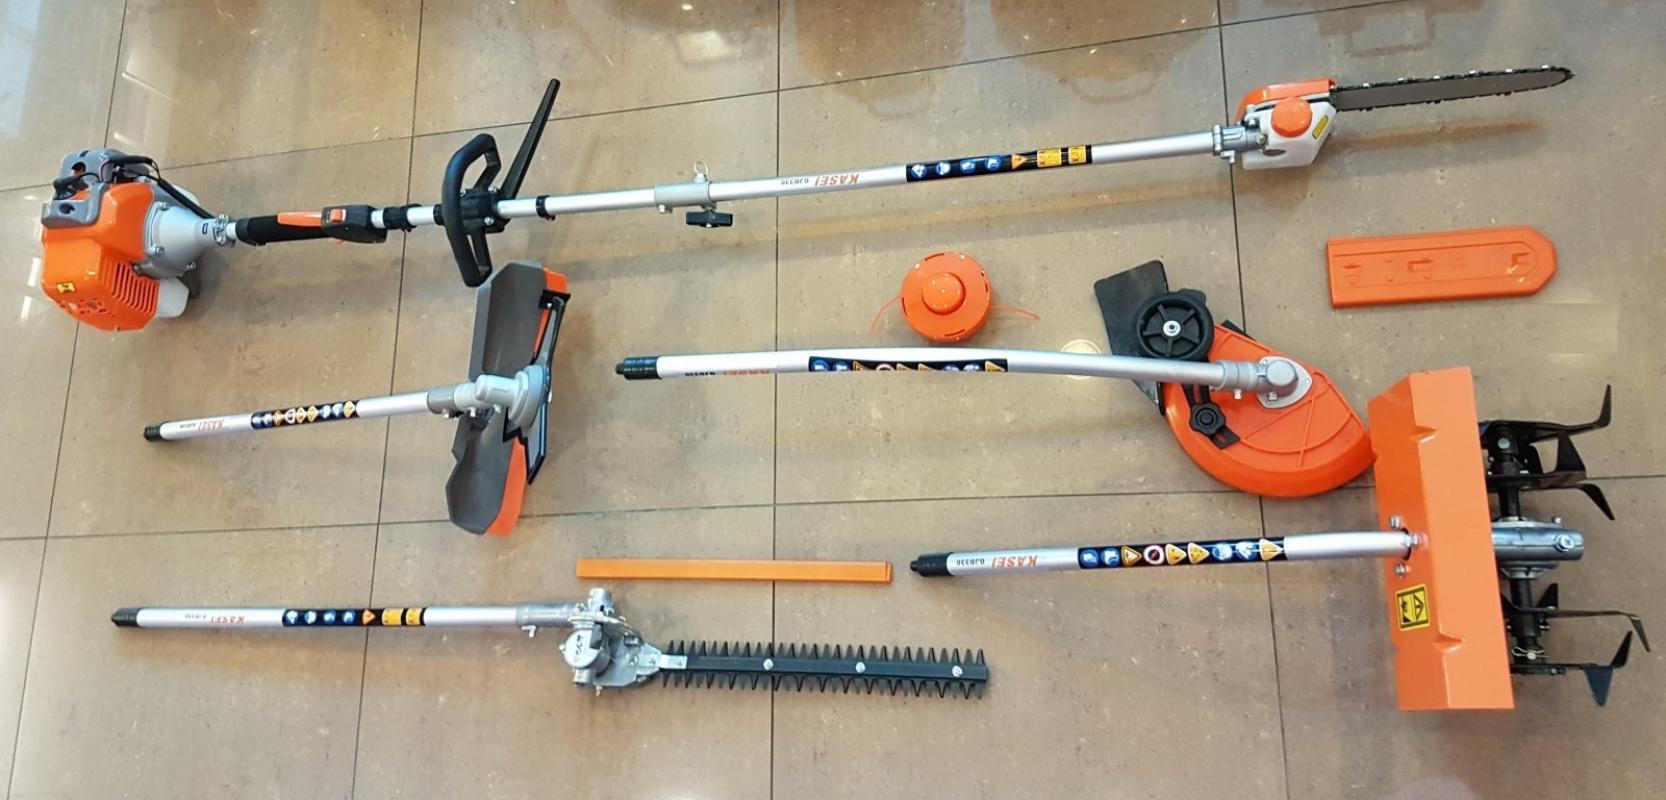 Kasei QJD330 Pole Pruner 5 in 1 Multi Tools Set ID228112